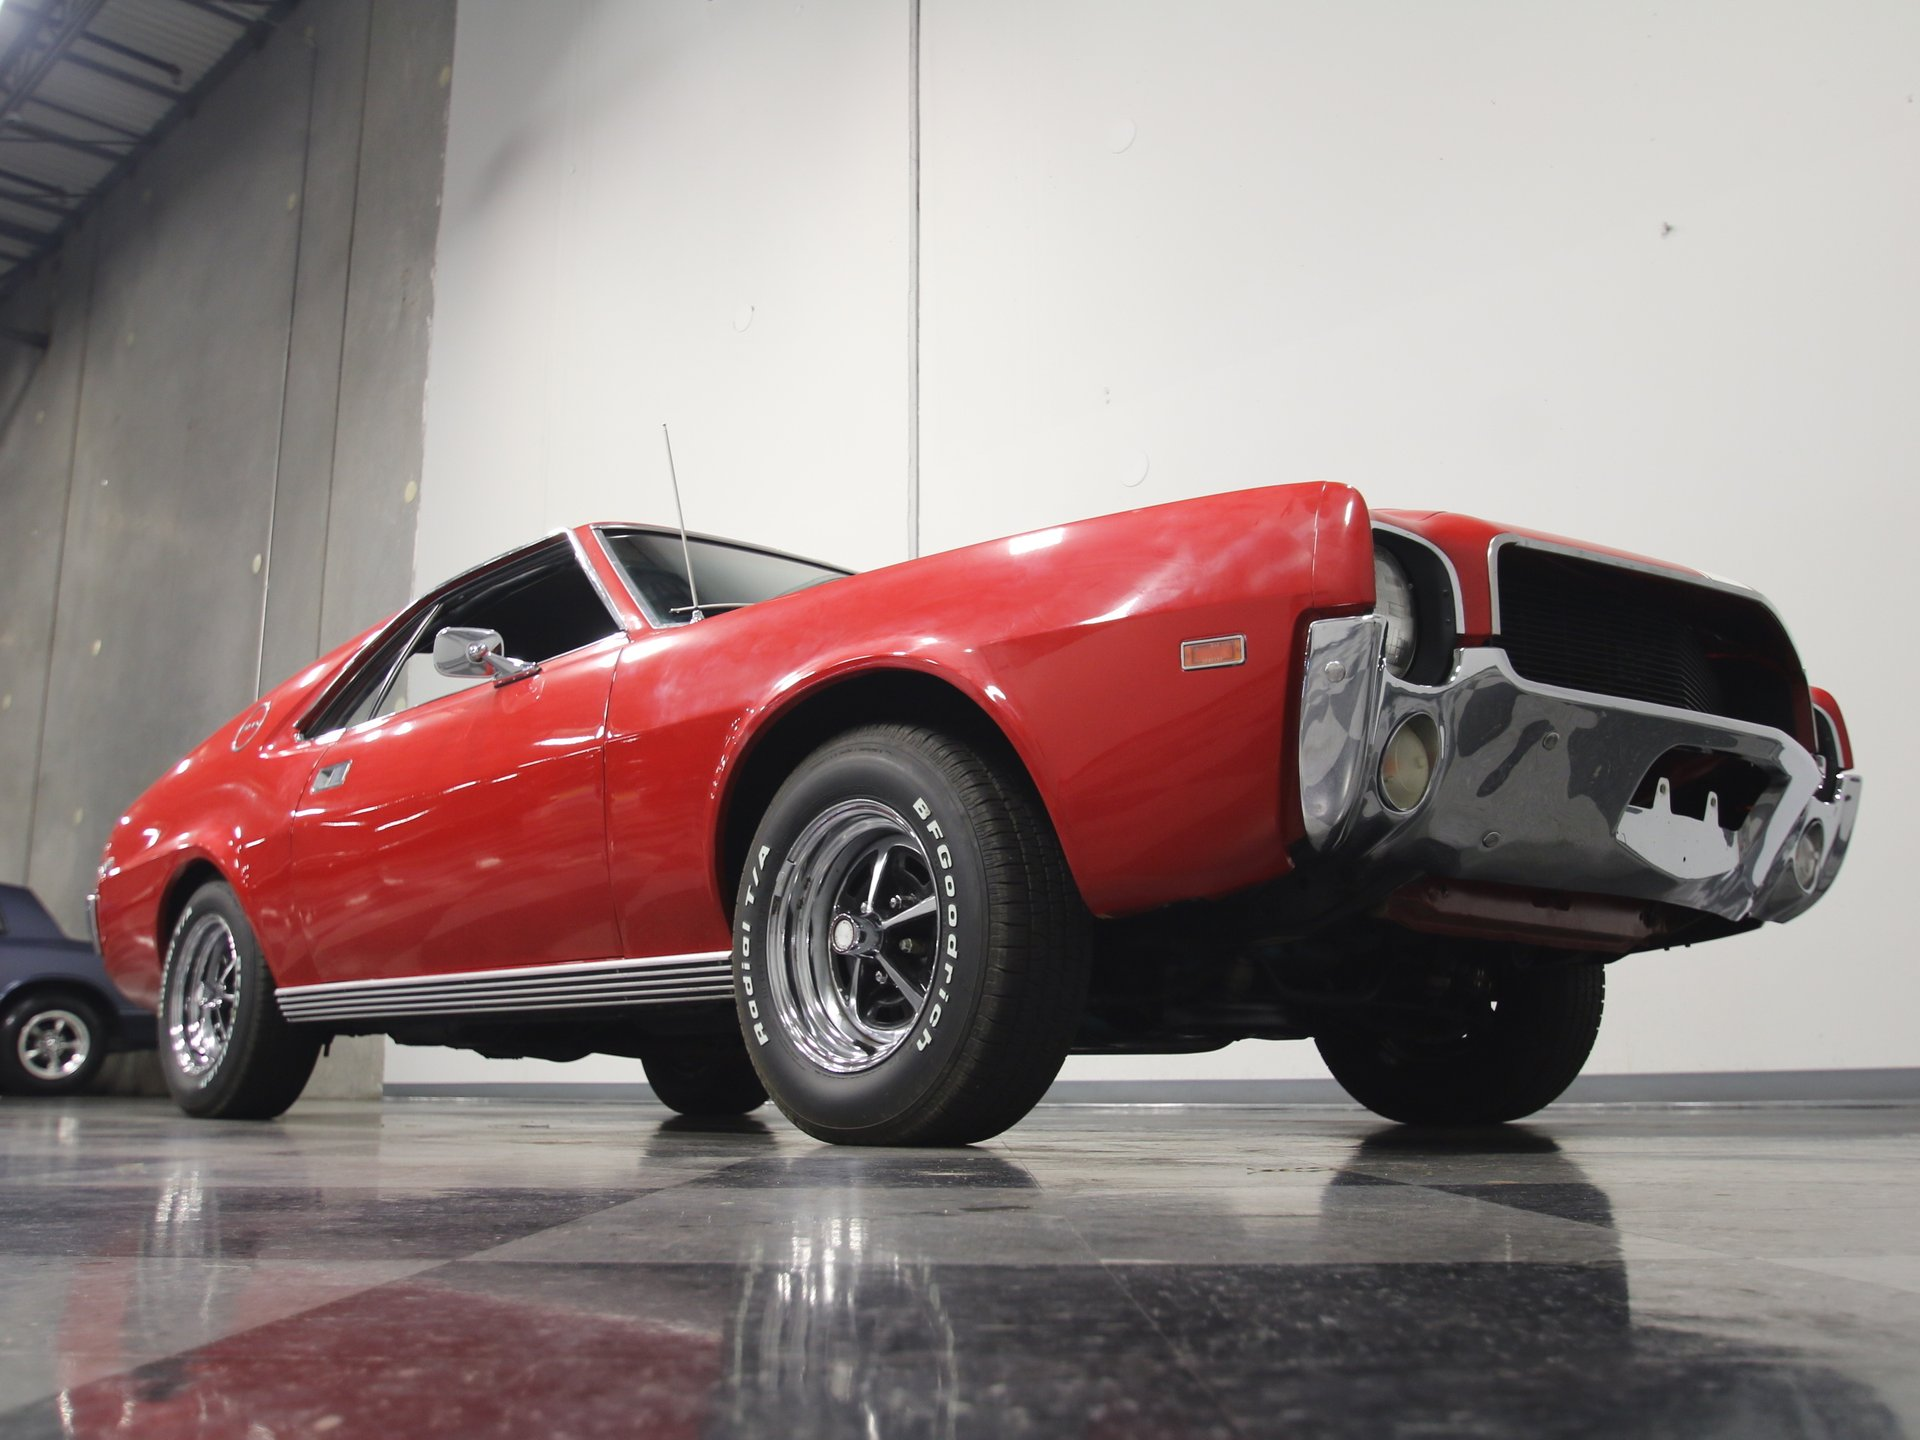 1968 AMC AMX | Streetside Classics - The Nation's Trusted Classic